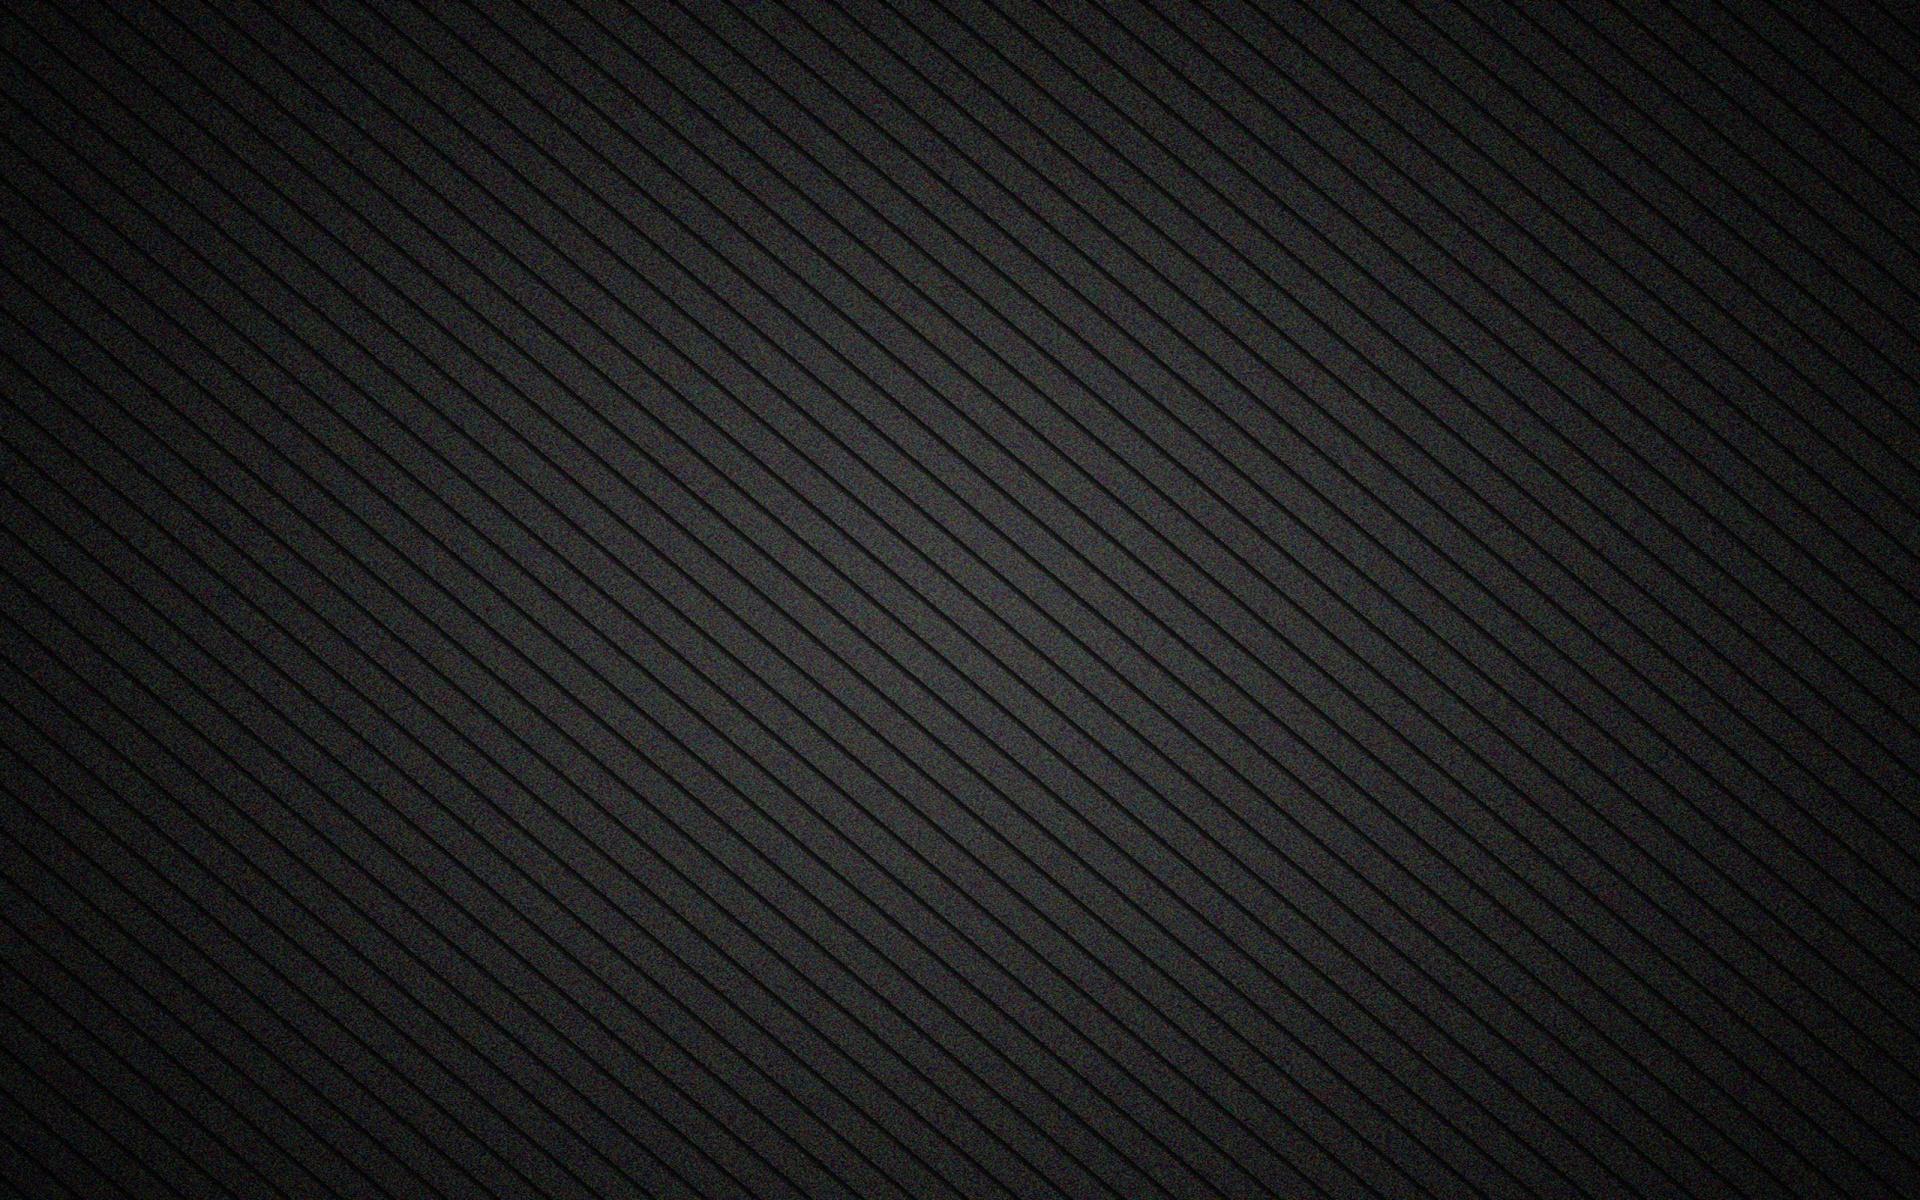 Black Wallpaper 30